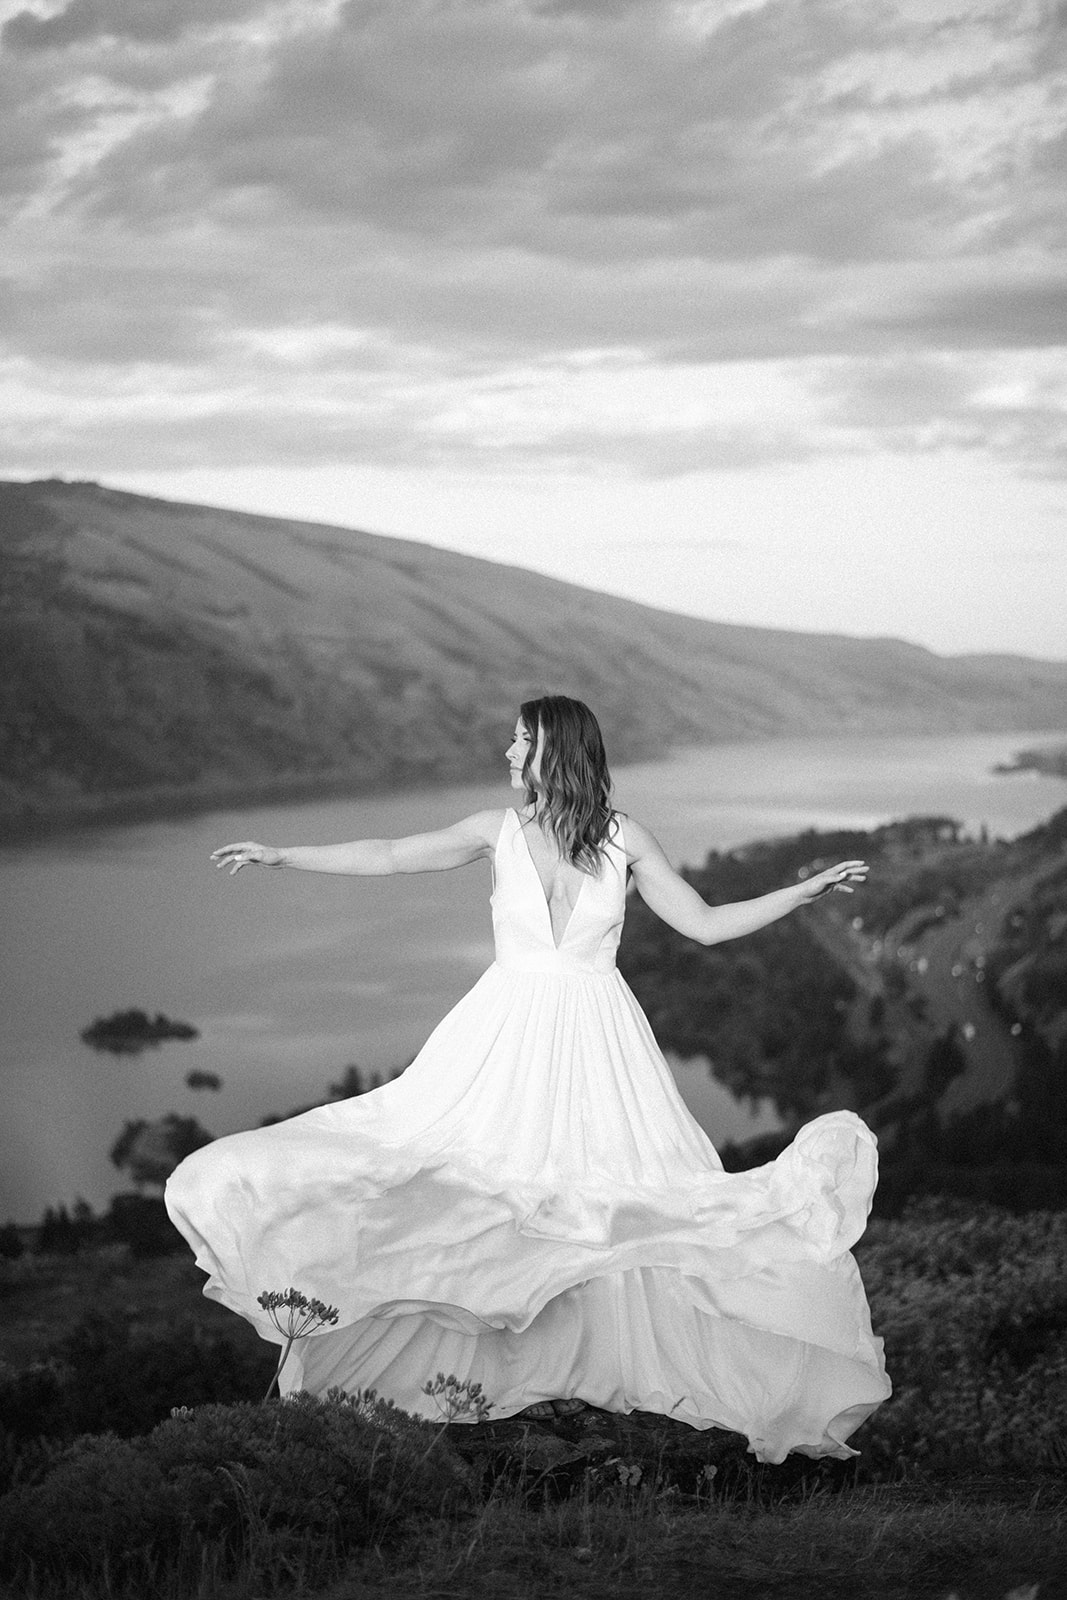 kamea_events_wedding_planner_portland_DeusAmor84.jpg